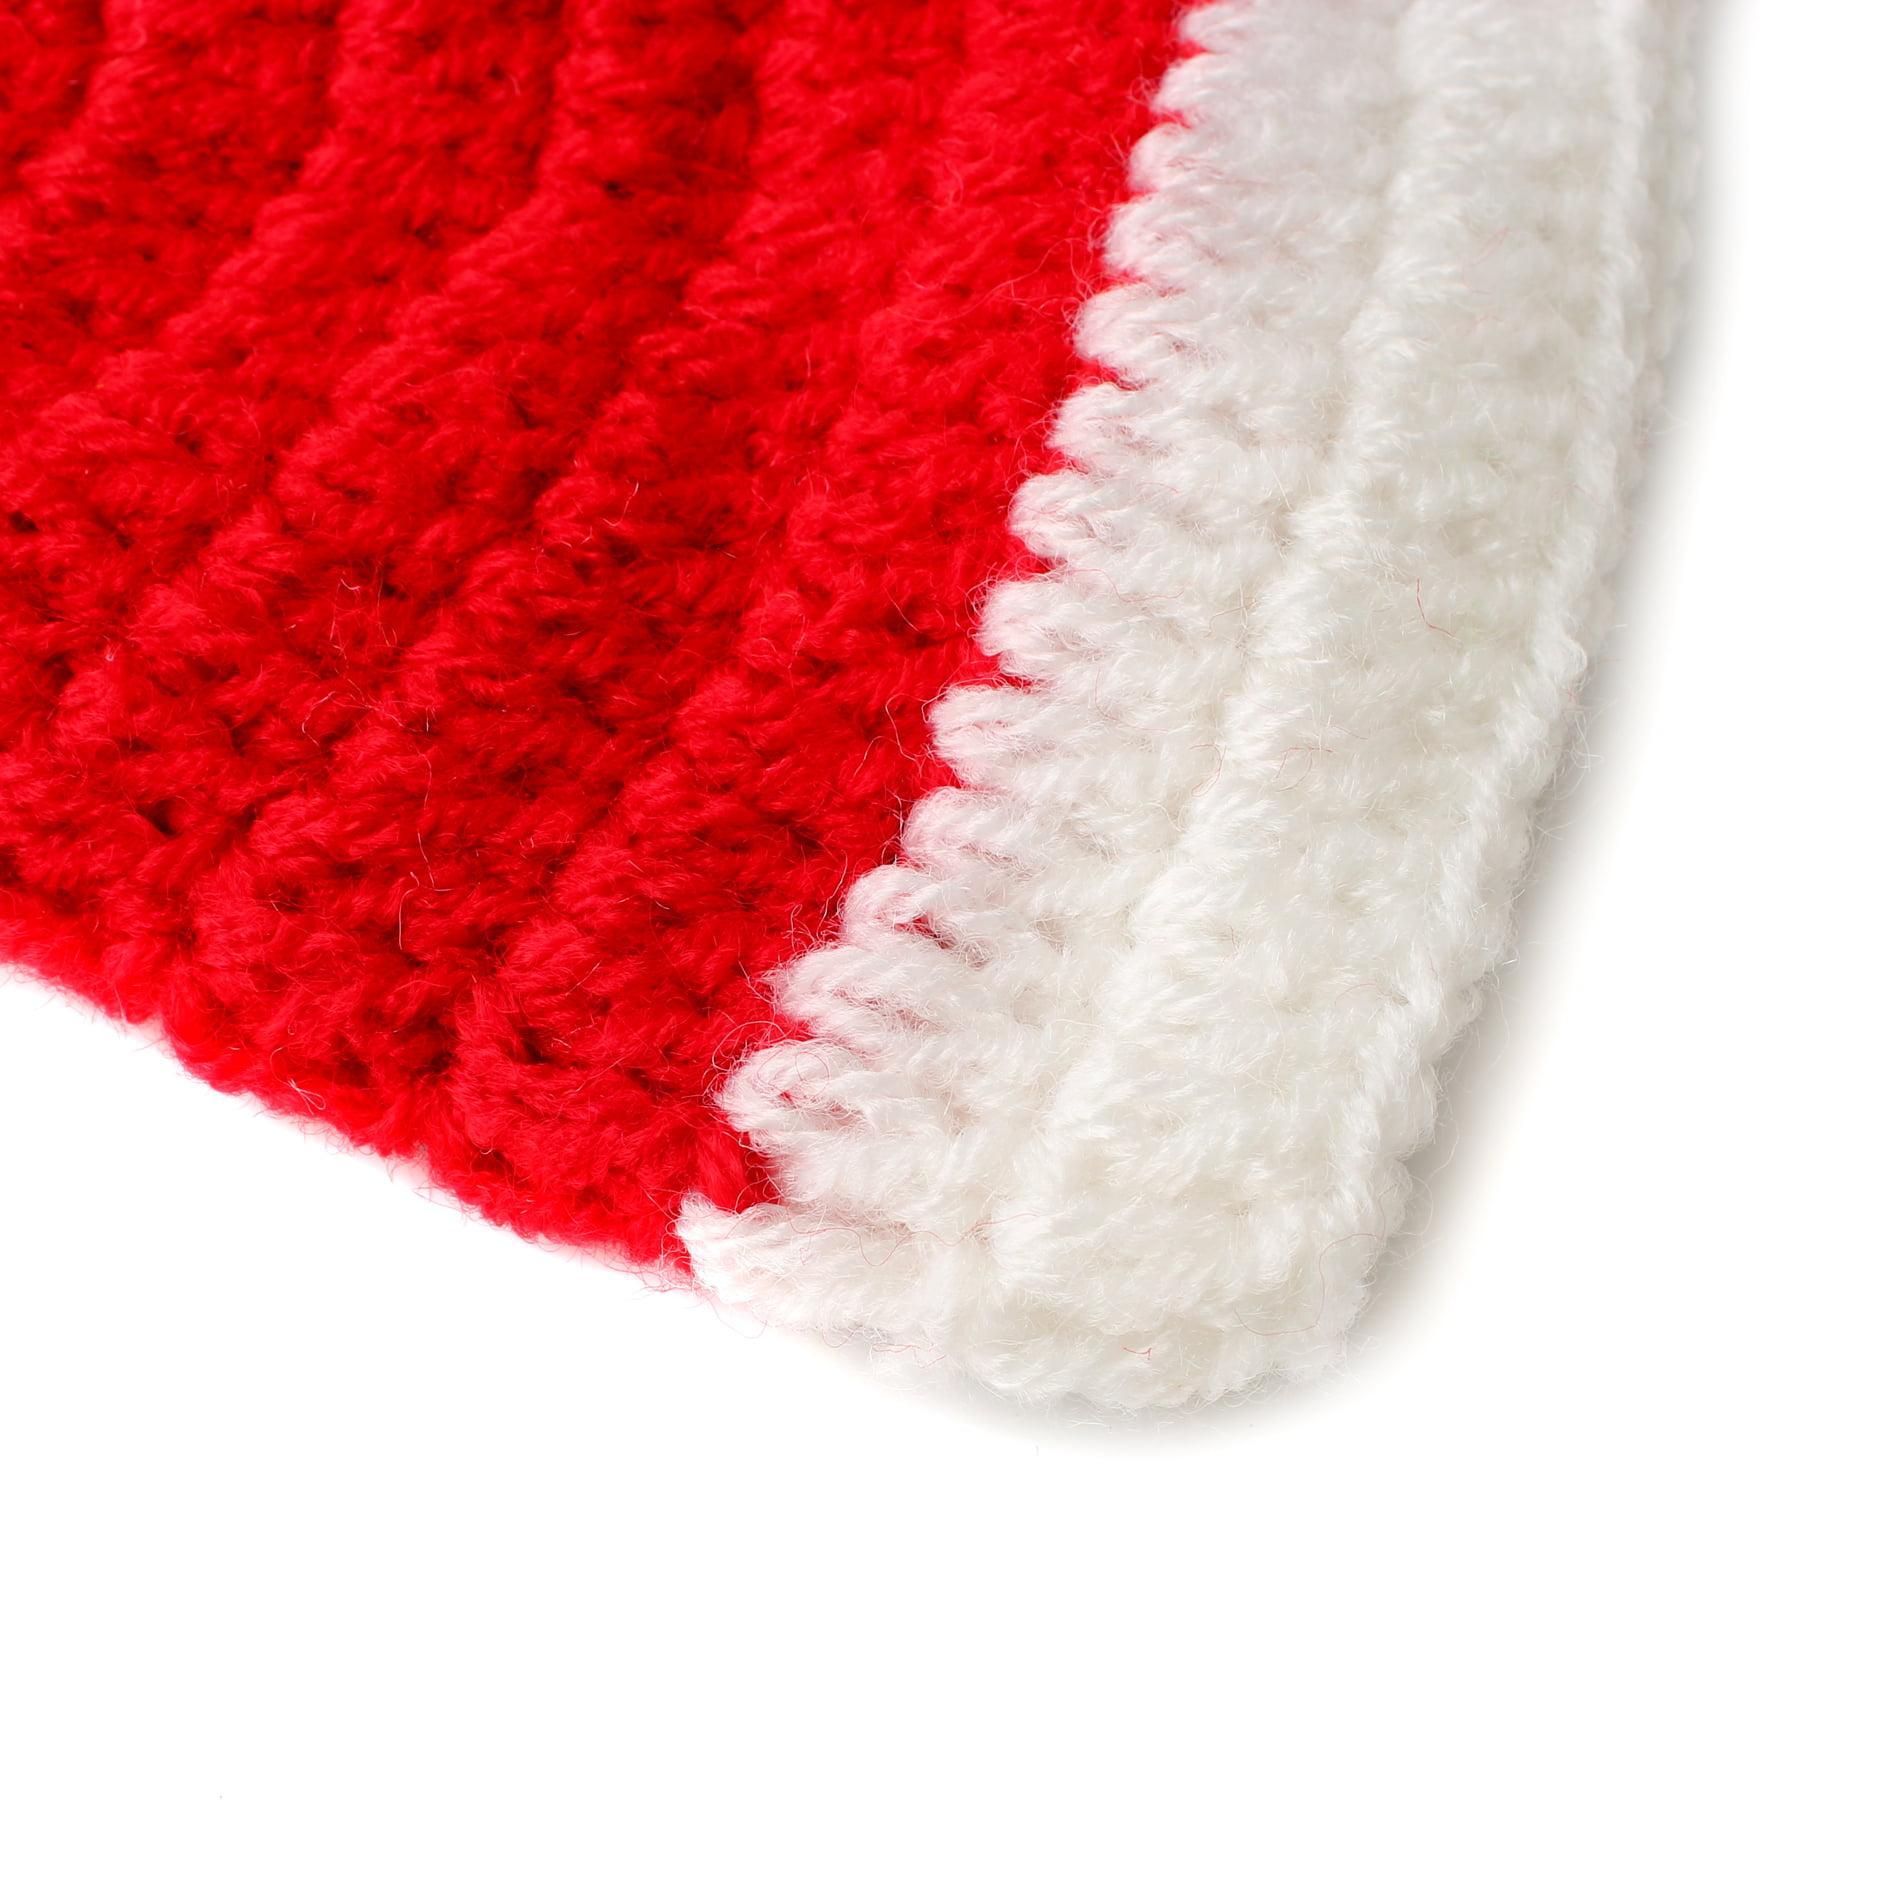 36b8f952b3e Newborn Baby Christmas Knit Crochet Hat Photography Props Costume Outfits  for Boys Girls - Santa Hat - Walmart.com